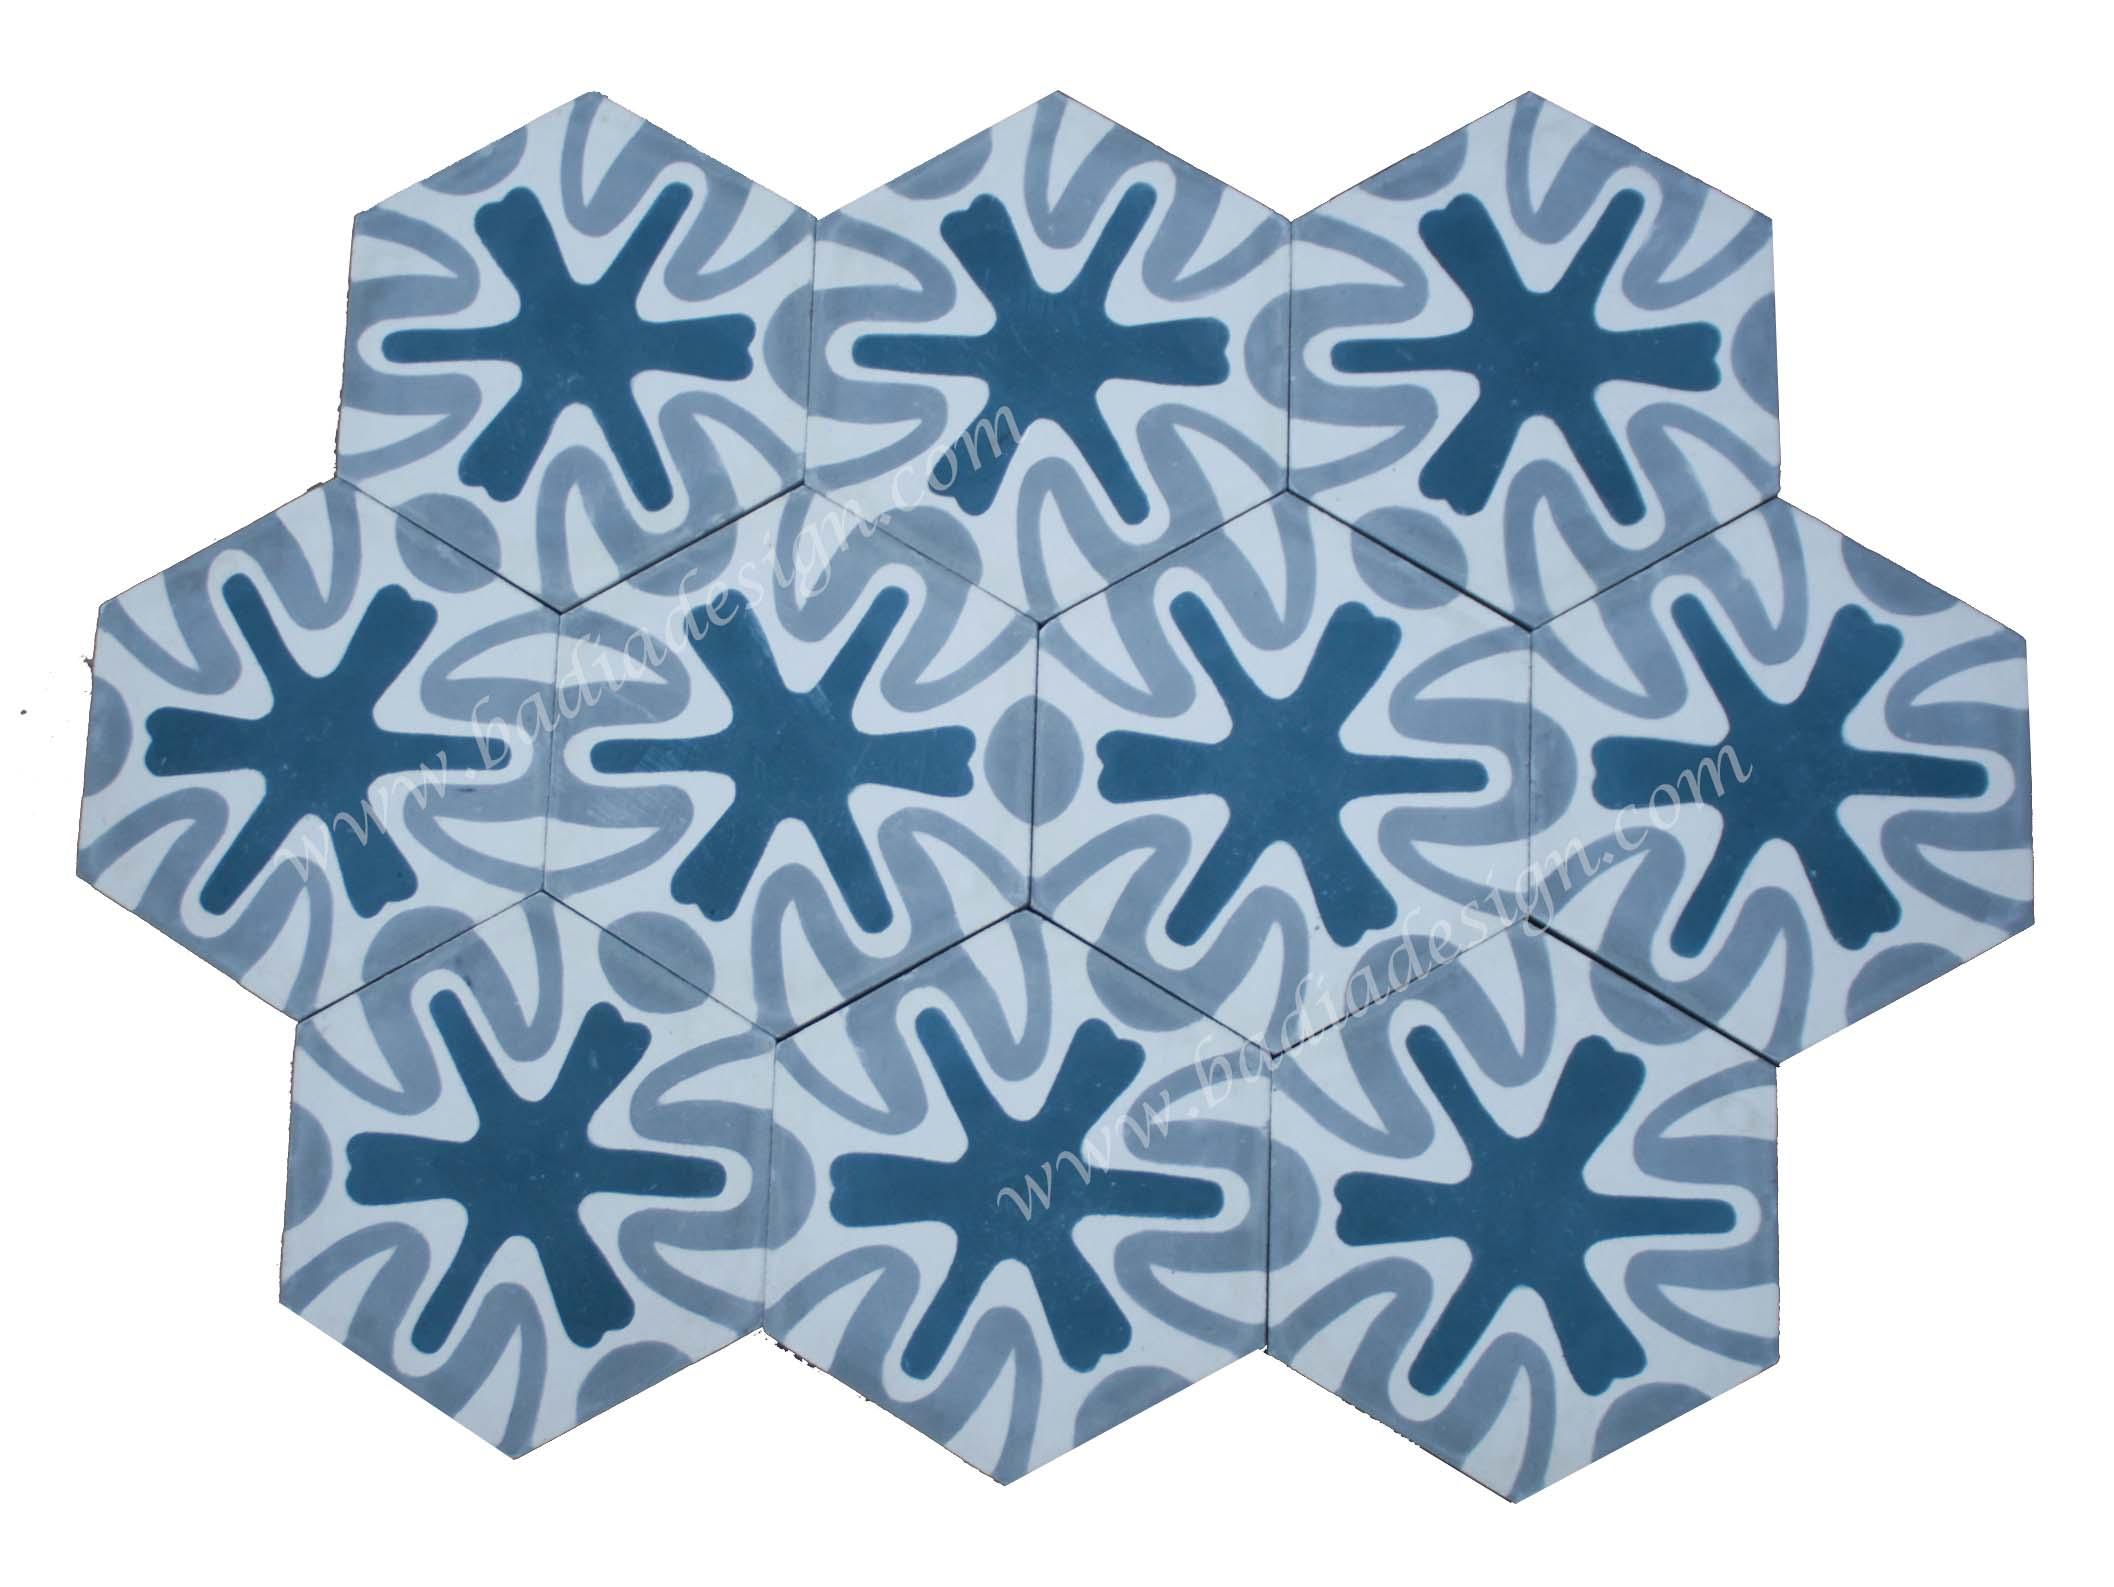 moroccan-hexagon-shaped-cement-tile-ct099-1.jpg